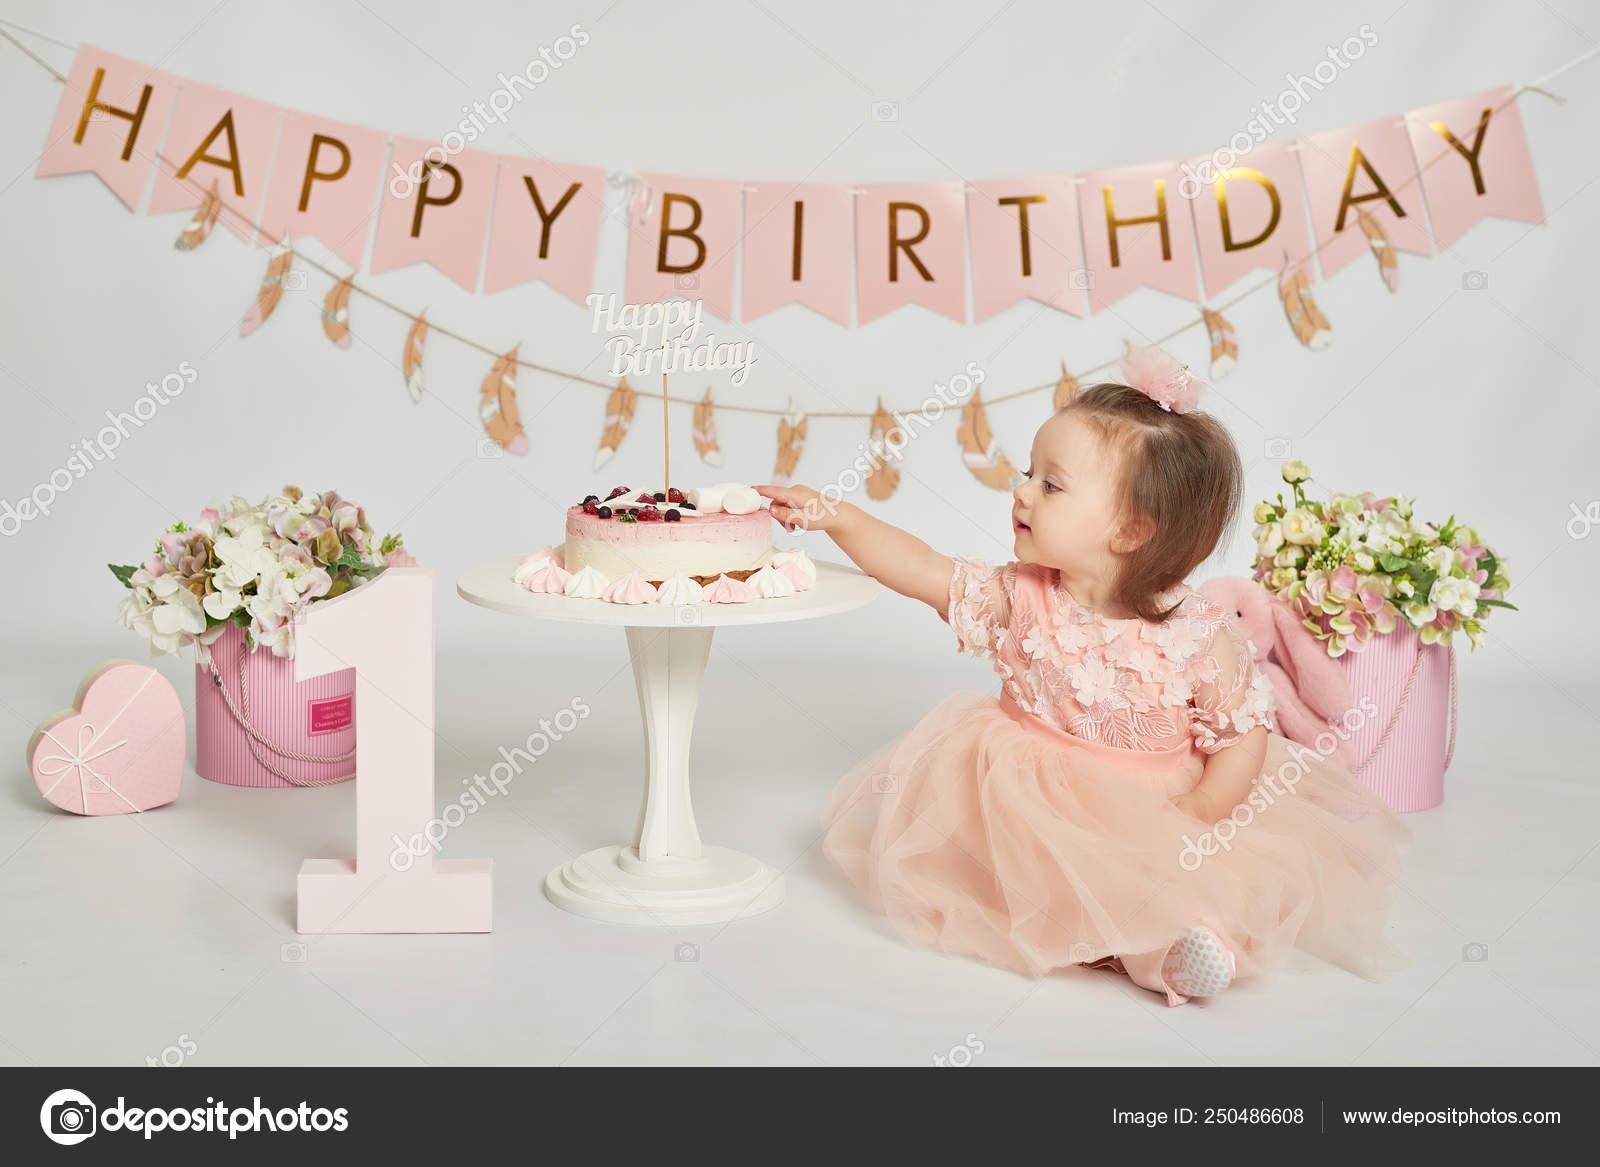 Sensational Girl Birthday Cake Year Old Baby Photo Session Stock Photo Birthday Cards Printable Opercafe Filternl